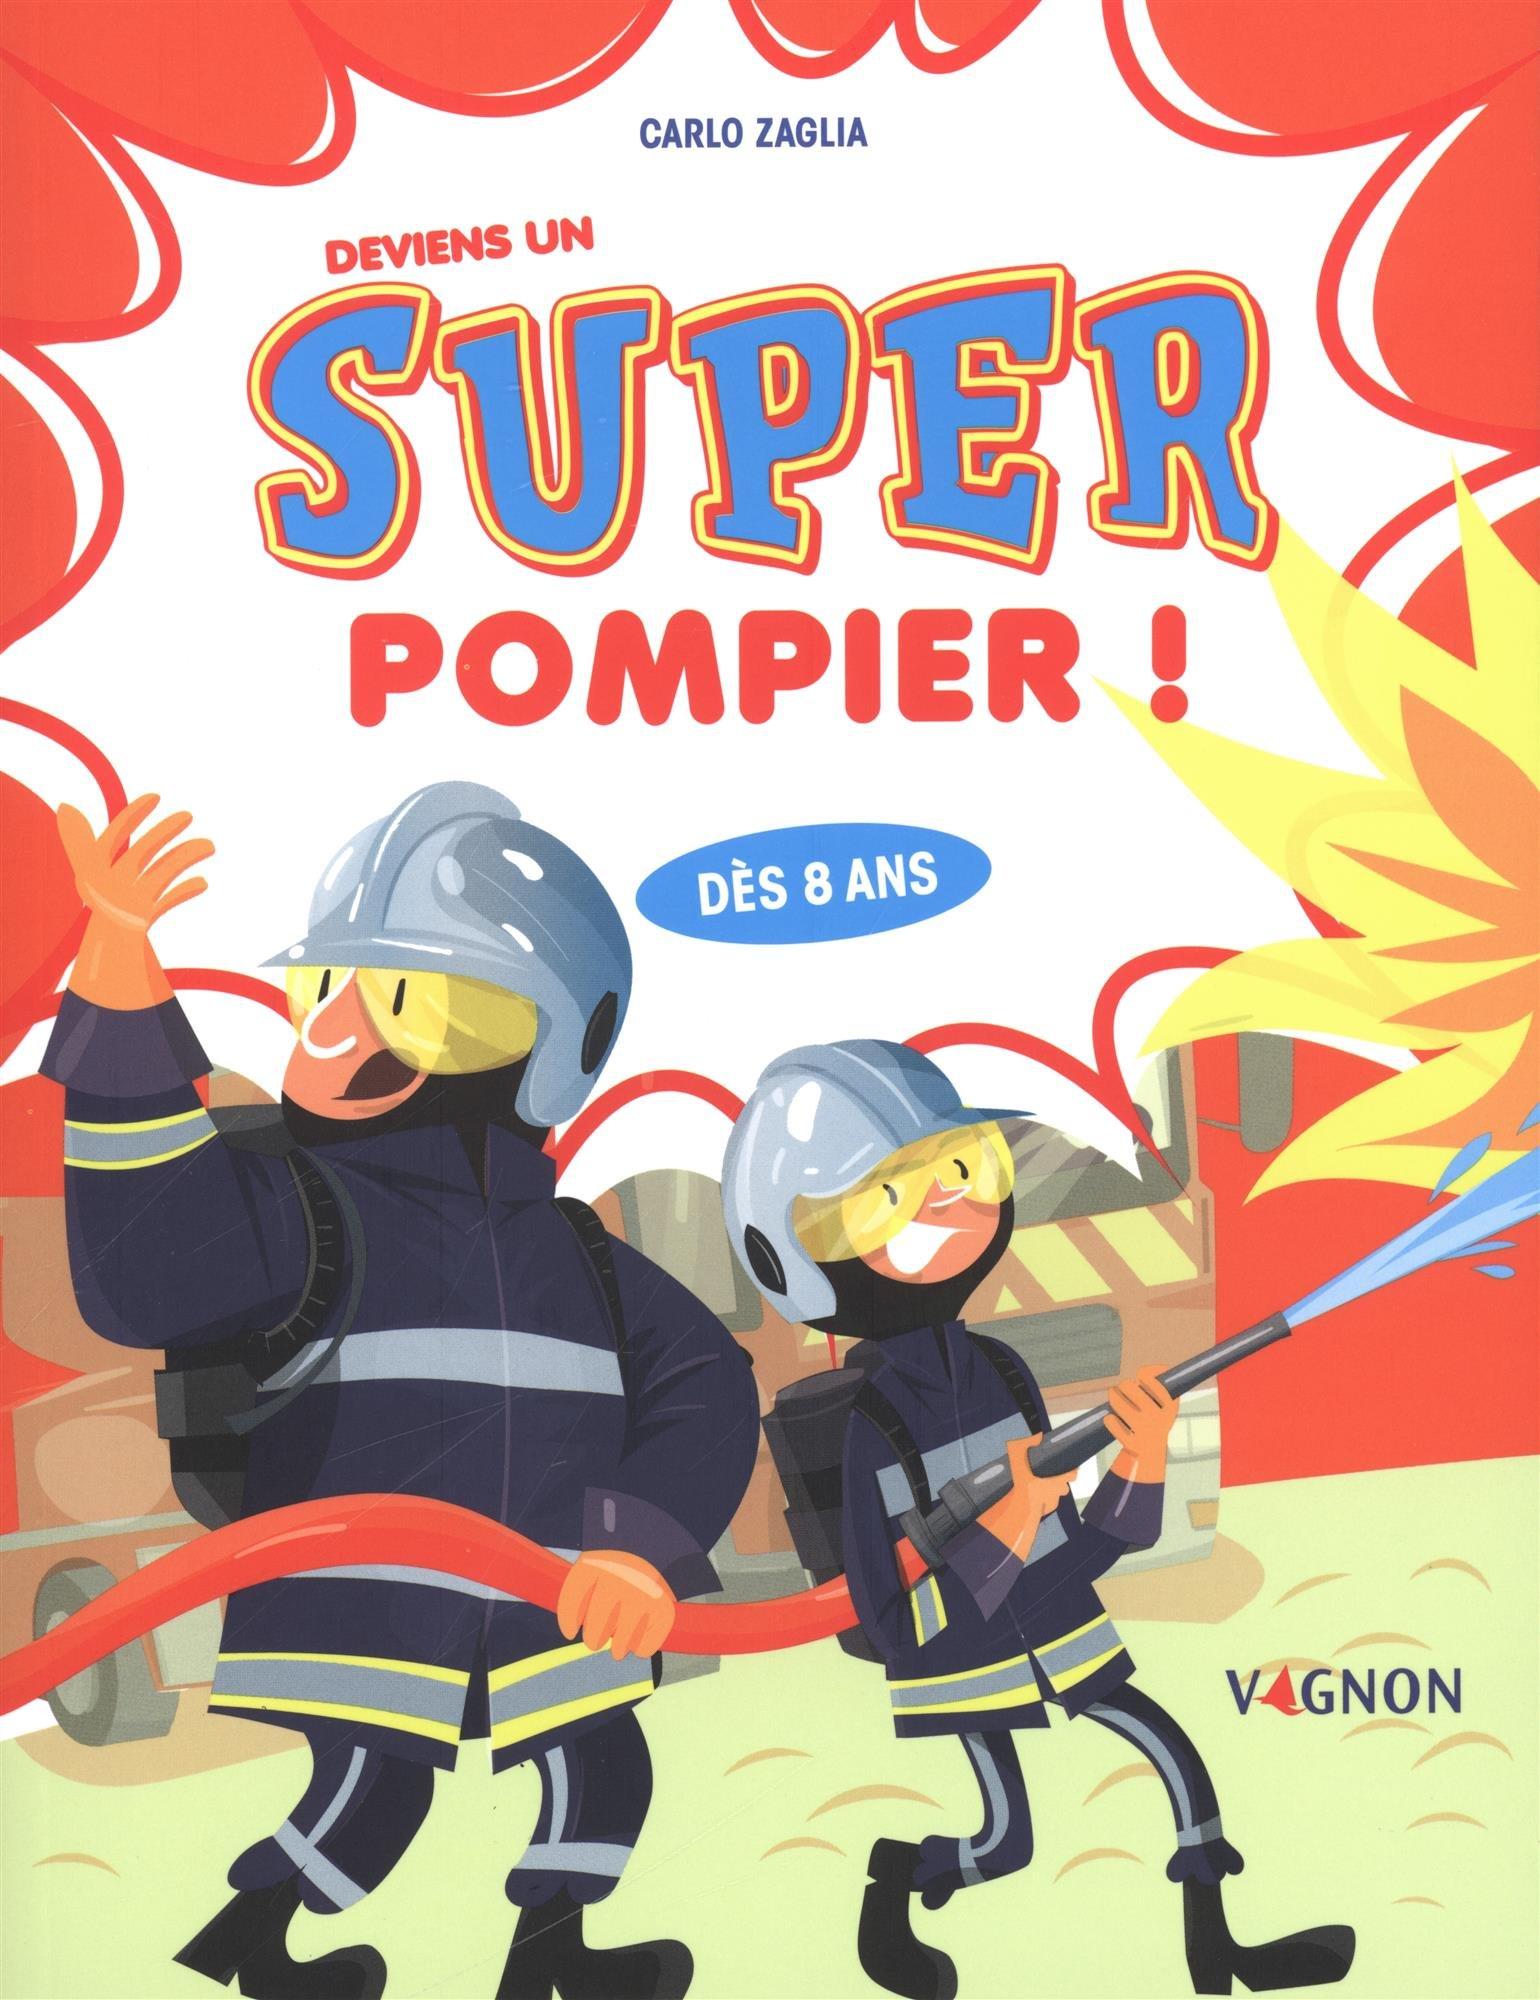 Deviens un super-pompier ! Broché – 8 juin 2018 Carlo Zaglia Marcel Pixel VAGNON PERMIS P B079VSH2WL